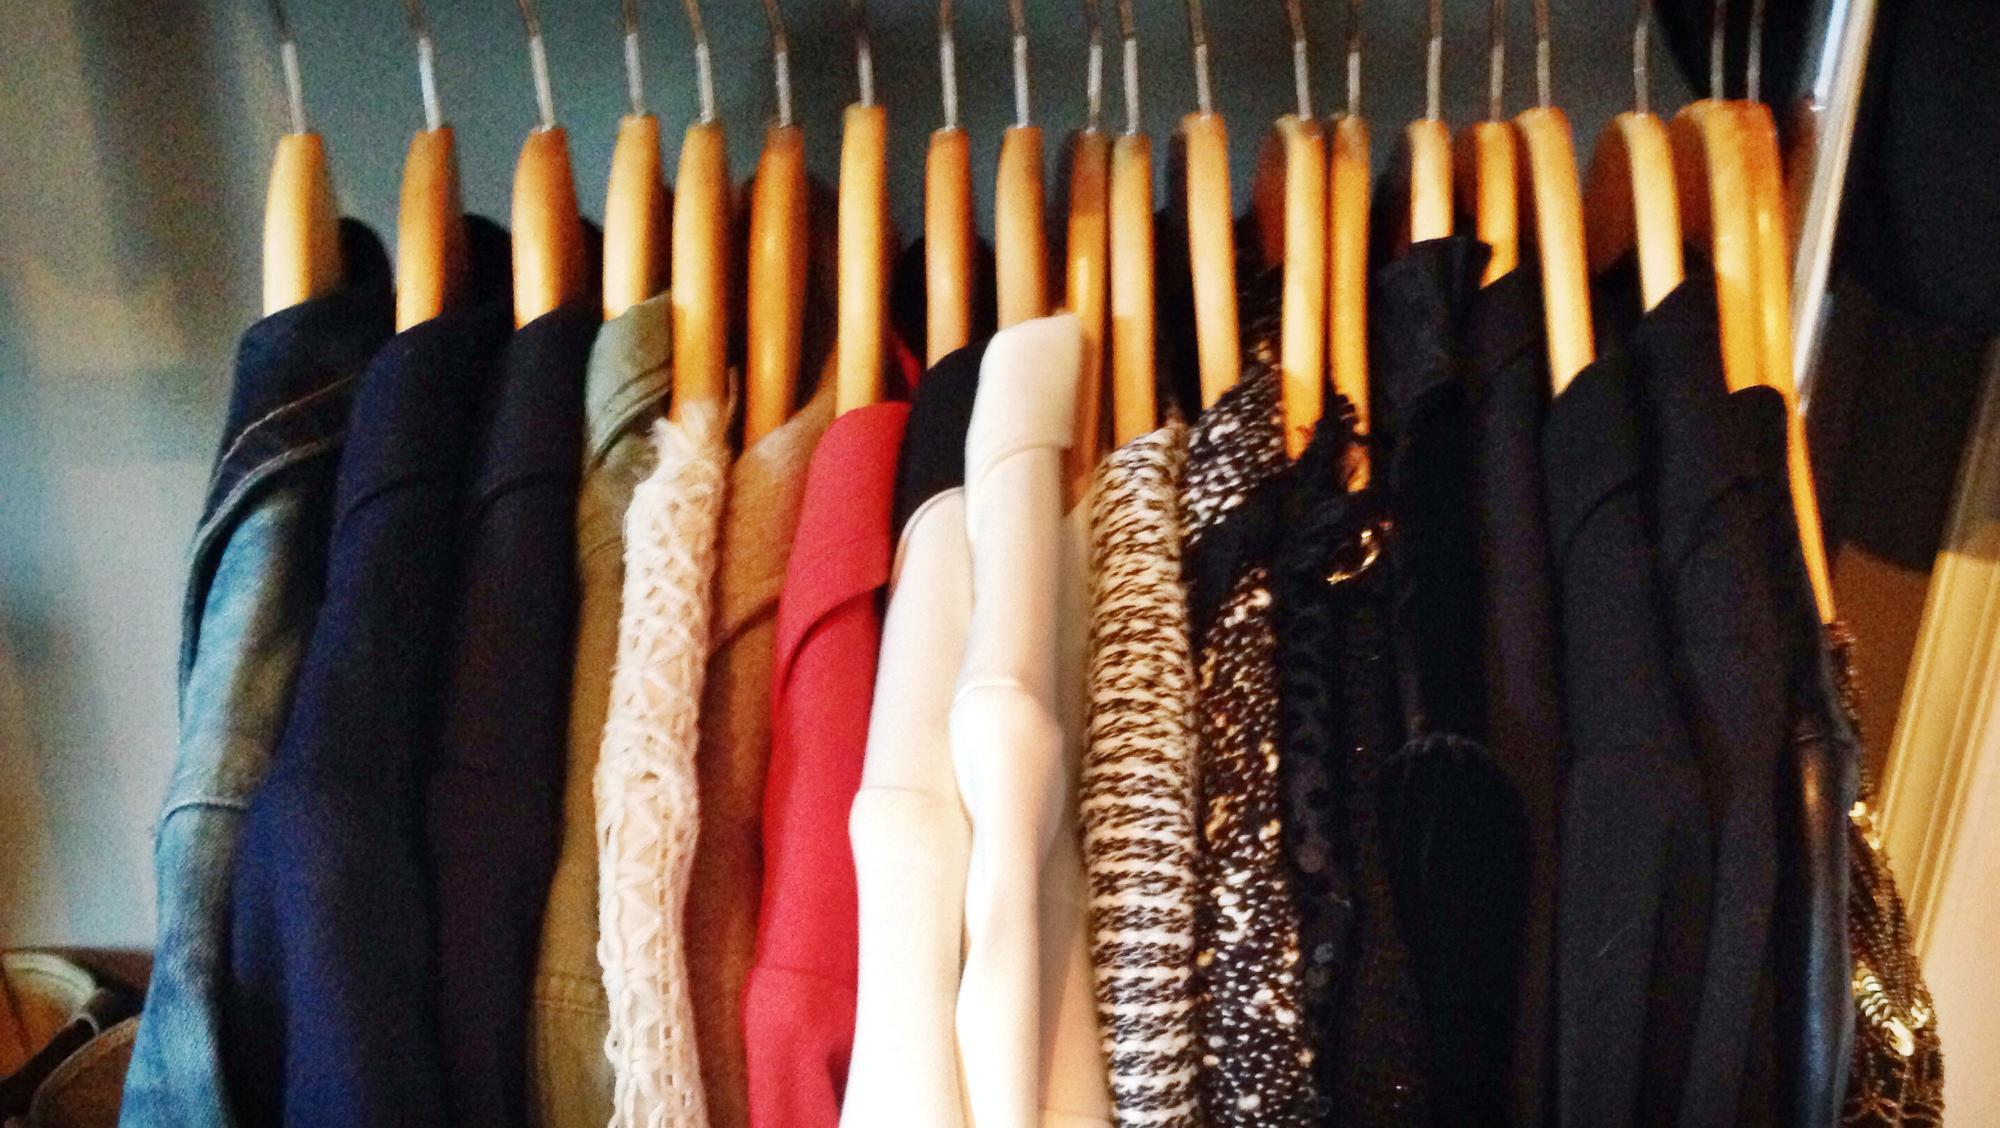 Coats in closet